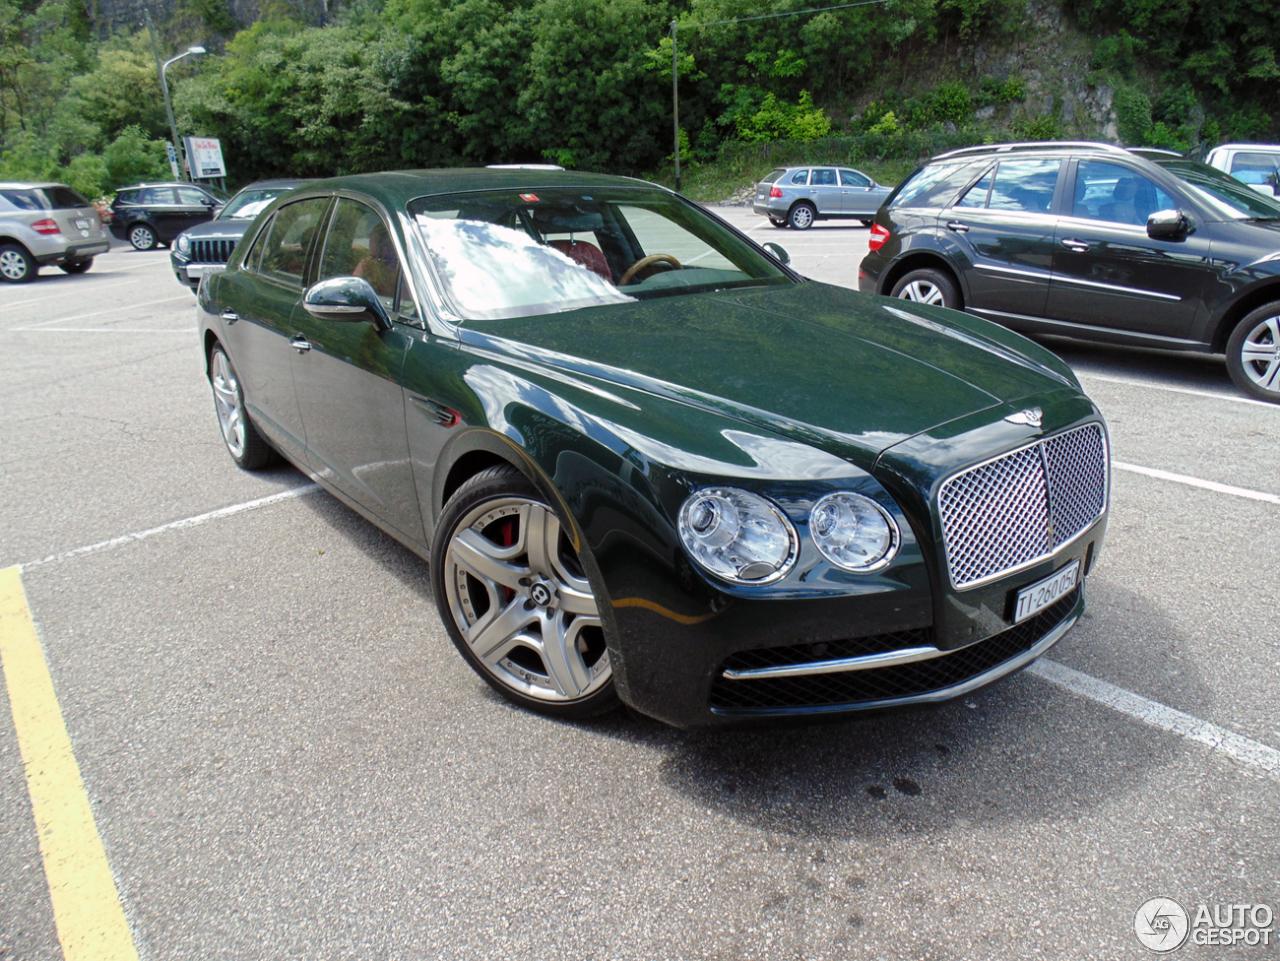 Bentley Flying Spur W12 14 July 2014 Autogespot